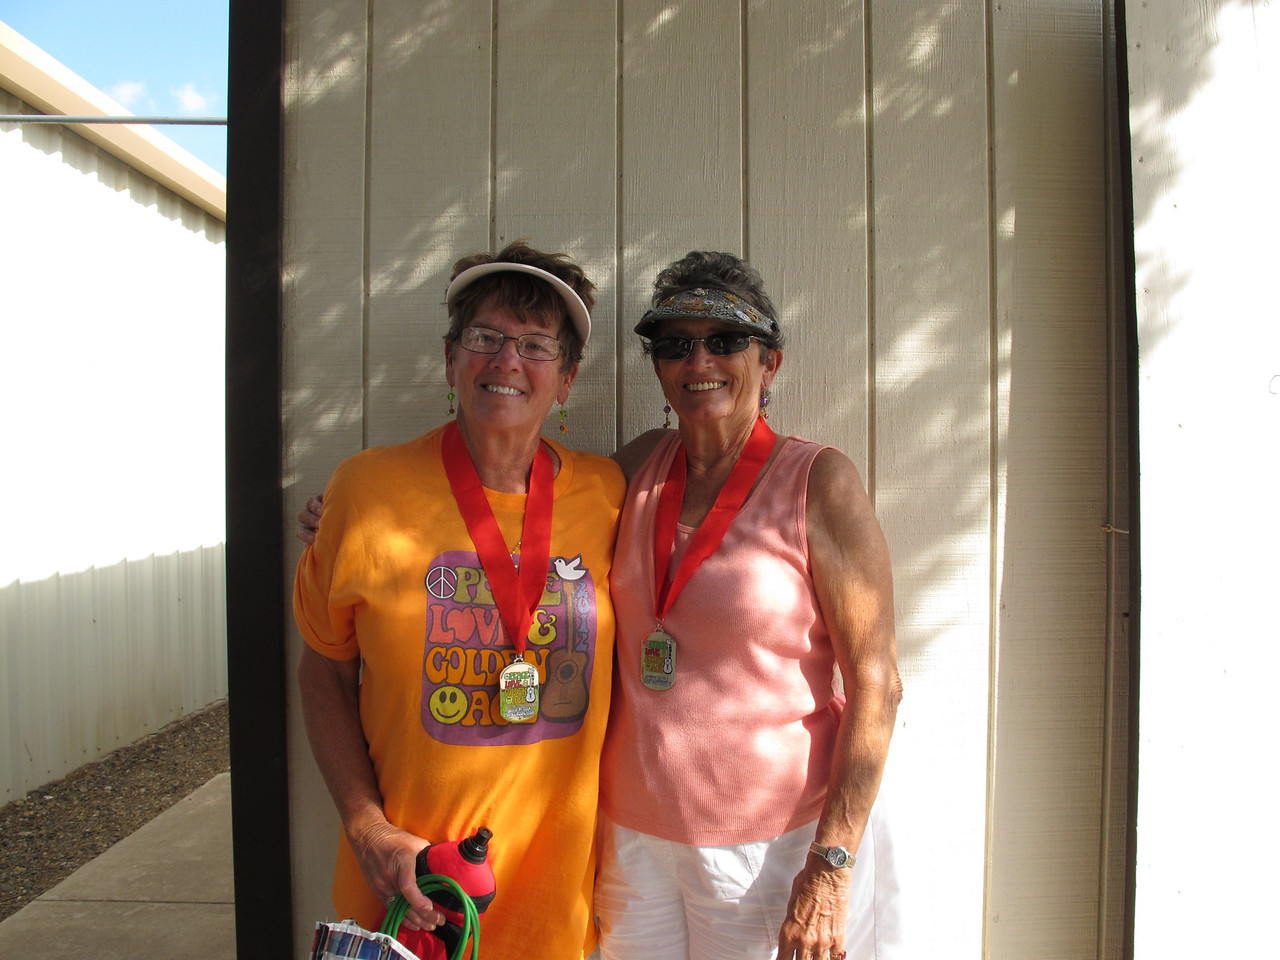 Shuffleboard Women's Doubles Expert 2nd Place - Kathy Lamphere (Ranchero Village) & Betty Hall (Snow to Sun)